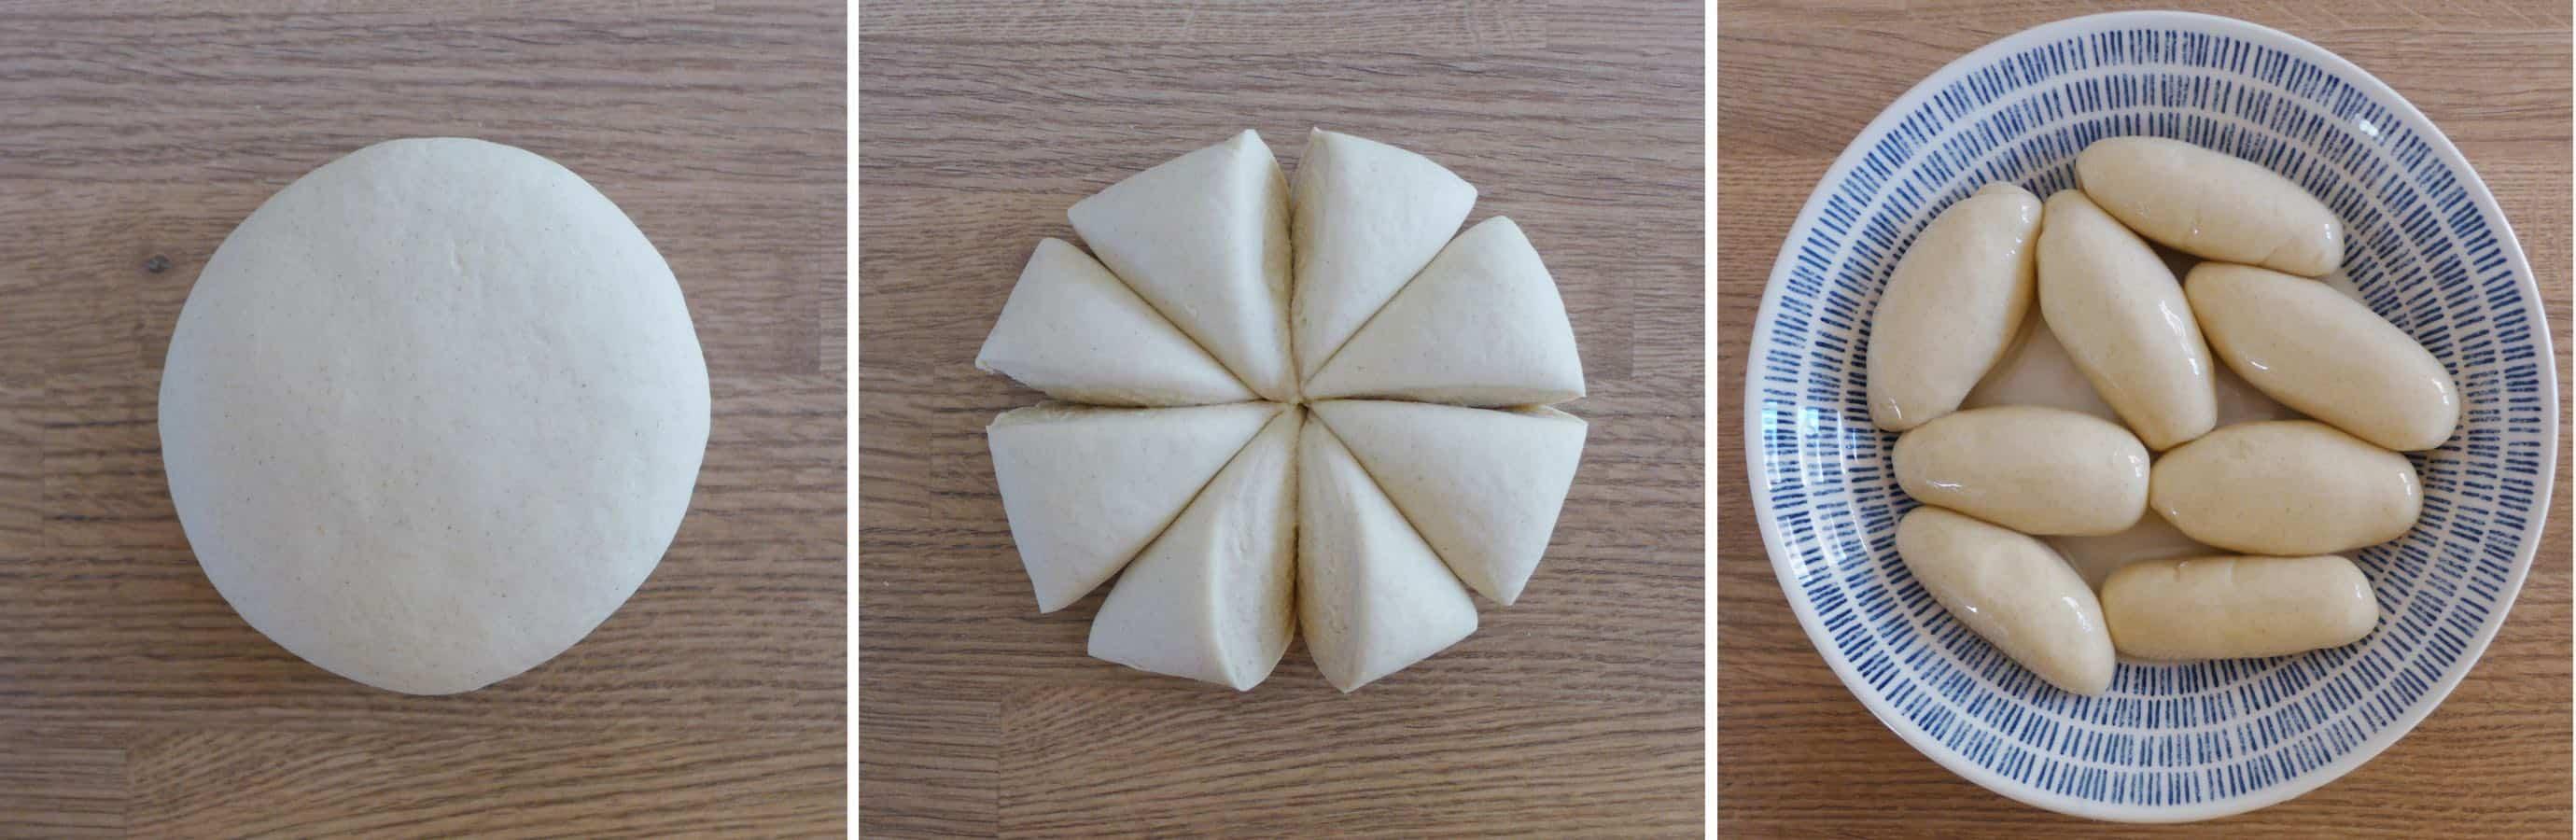 Dough for making Biang Biang Noodles